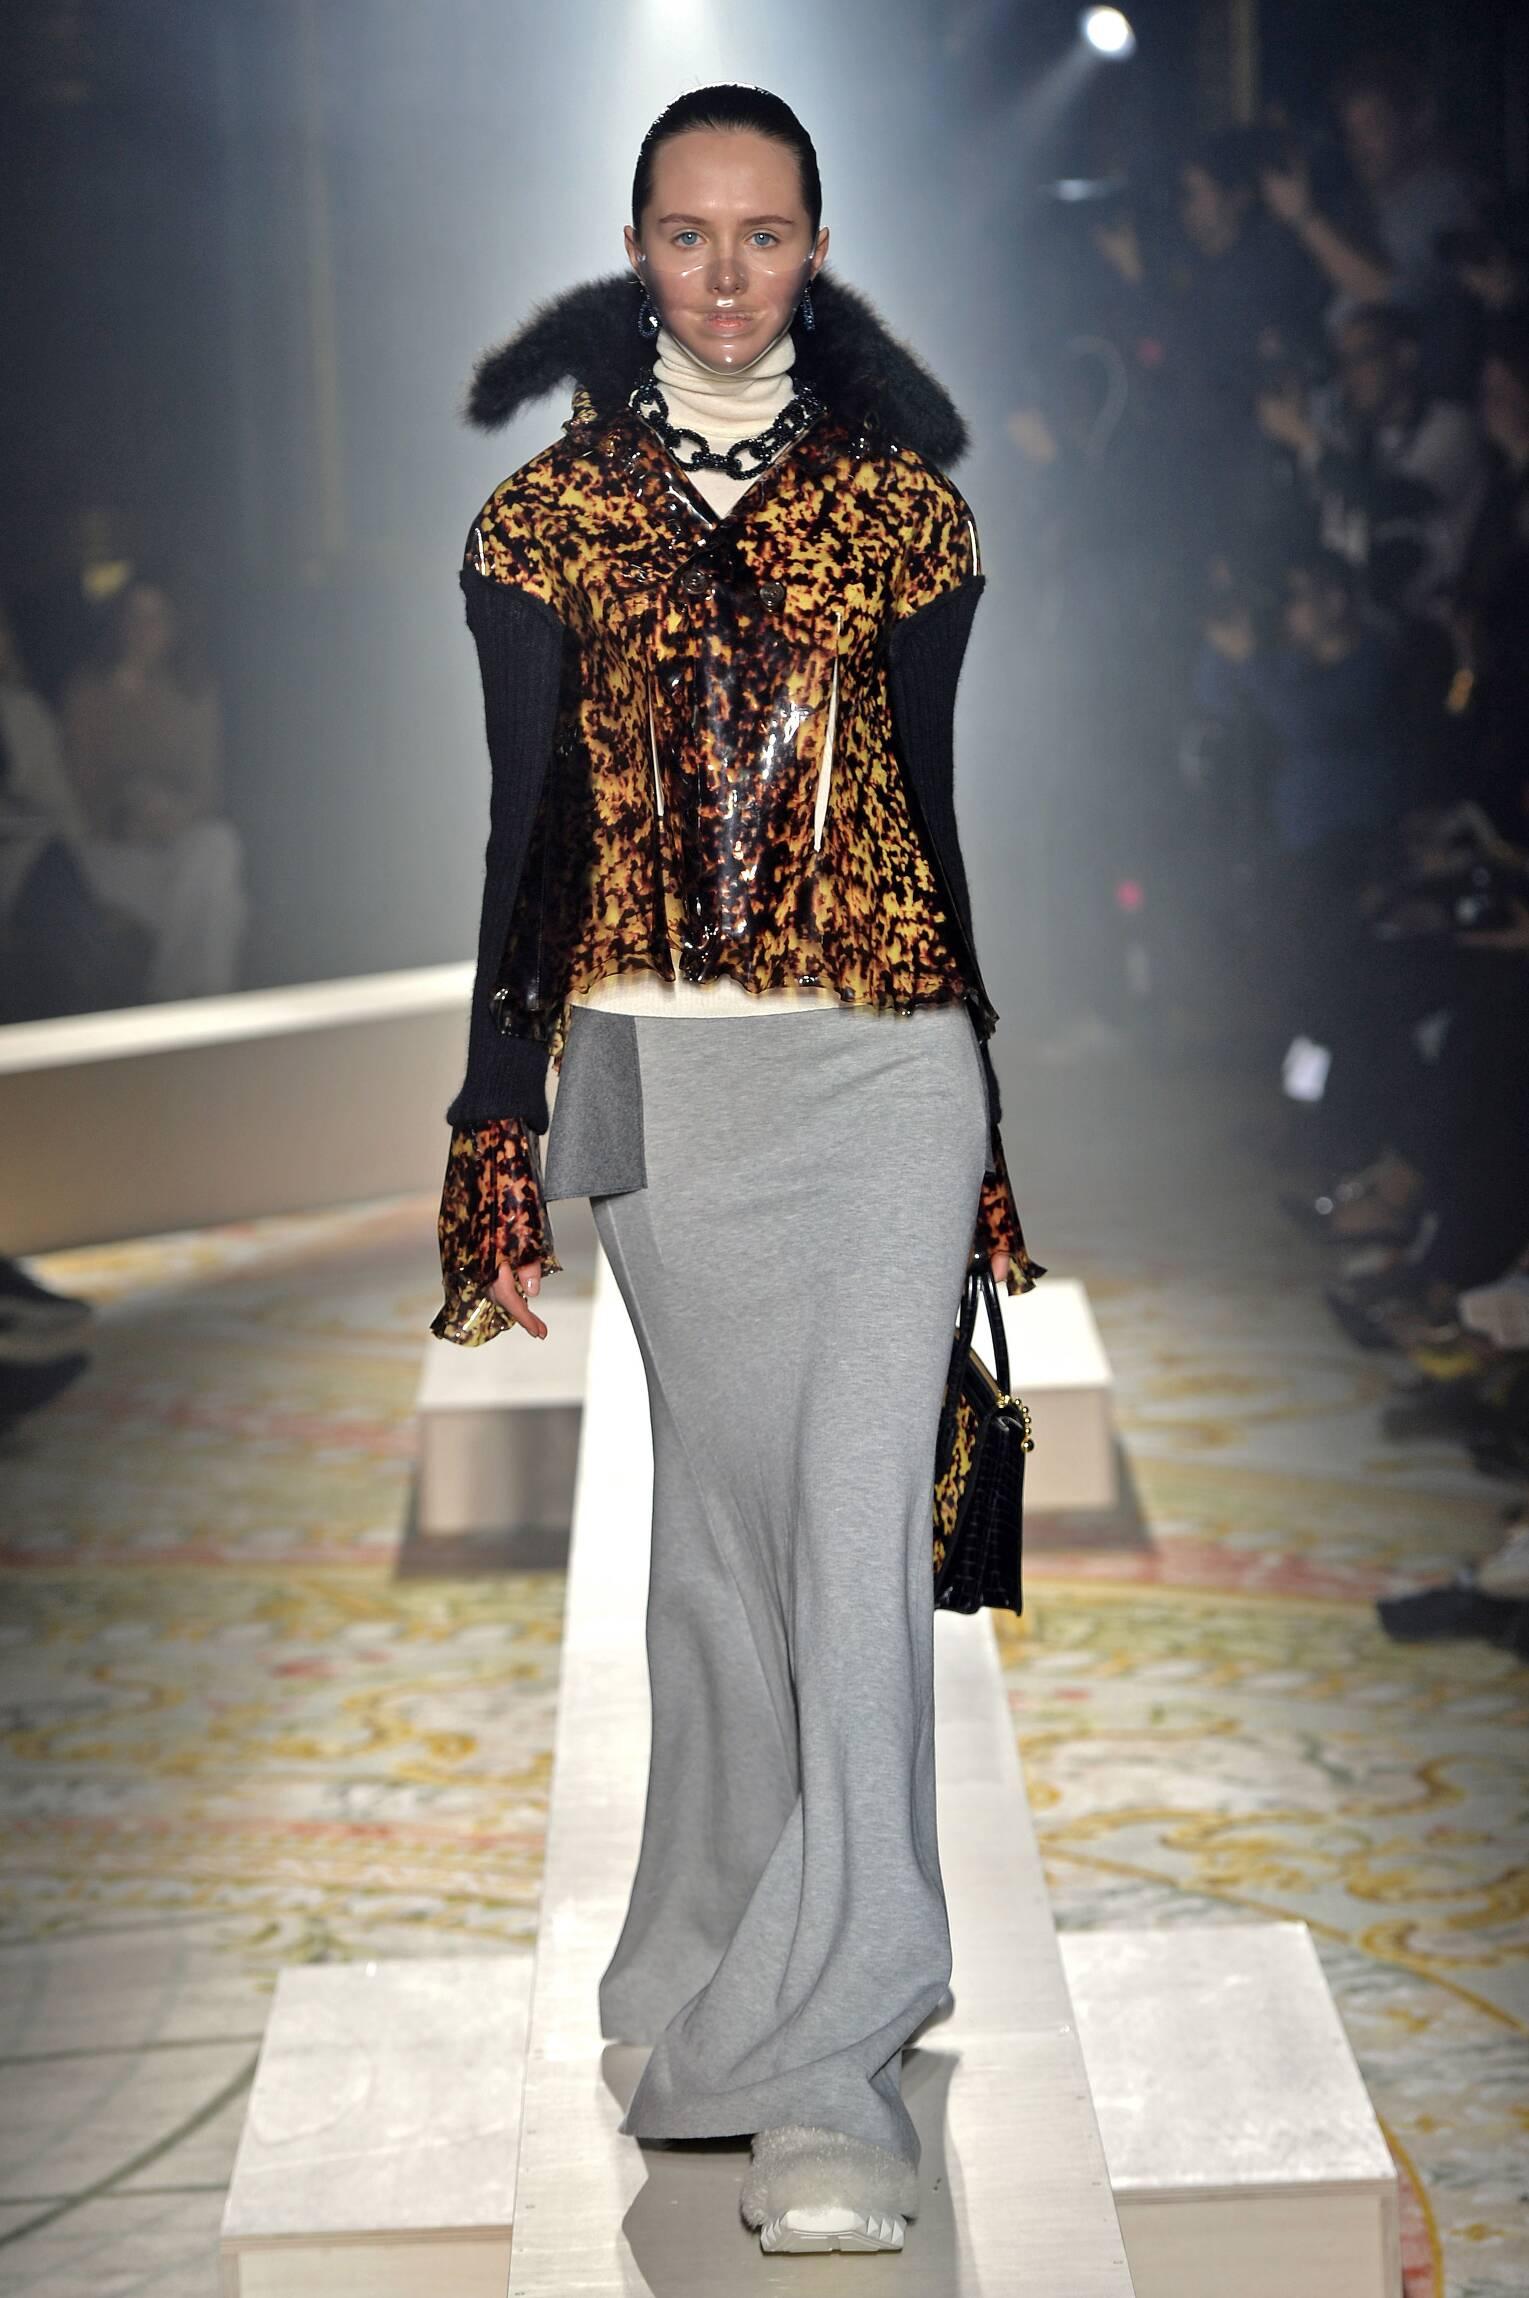 Catwalk Undercover Fall Winter 2015 16 Women's Collection Paris Fashion Week